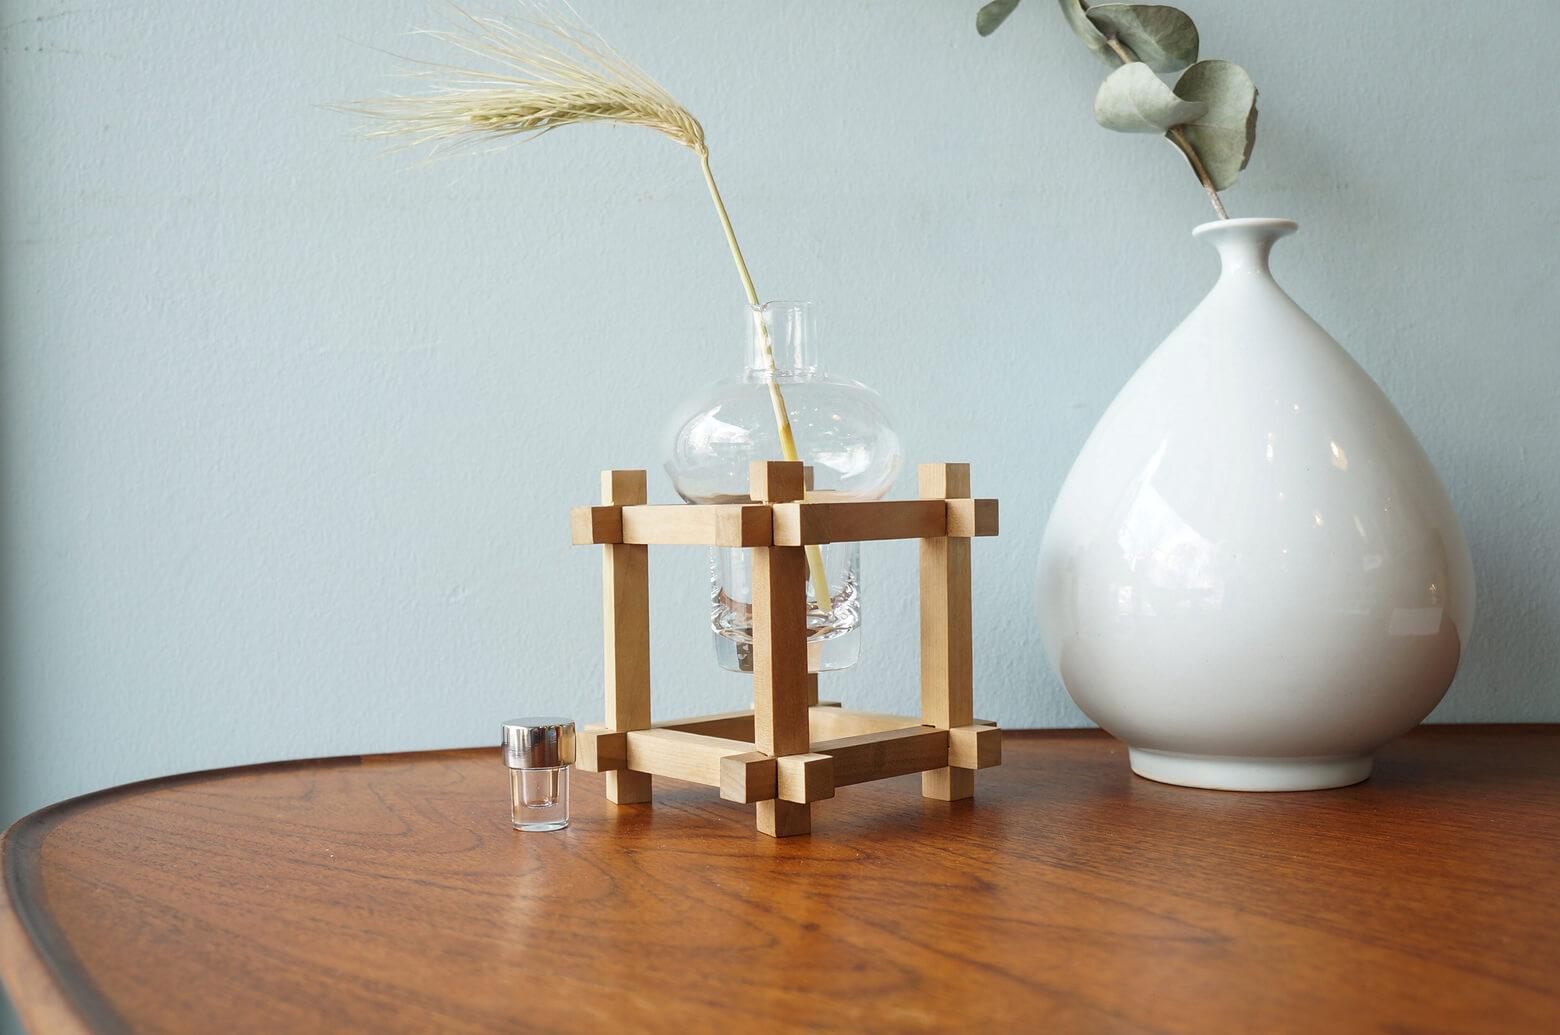 Yamanaka Kumiki Works Wooden Puzzle/山中組木工房 玉入れ組木 マス組木 山中成夫 柳宗理 伝統工芸品